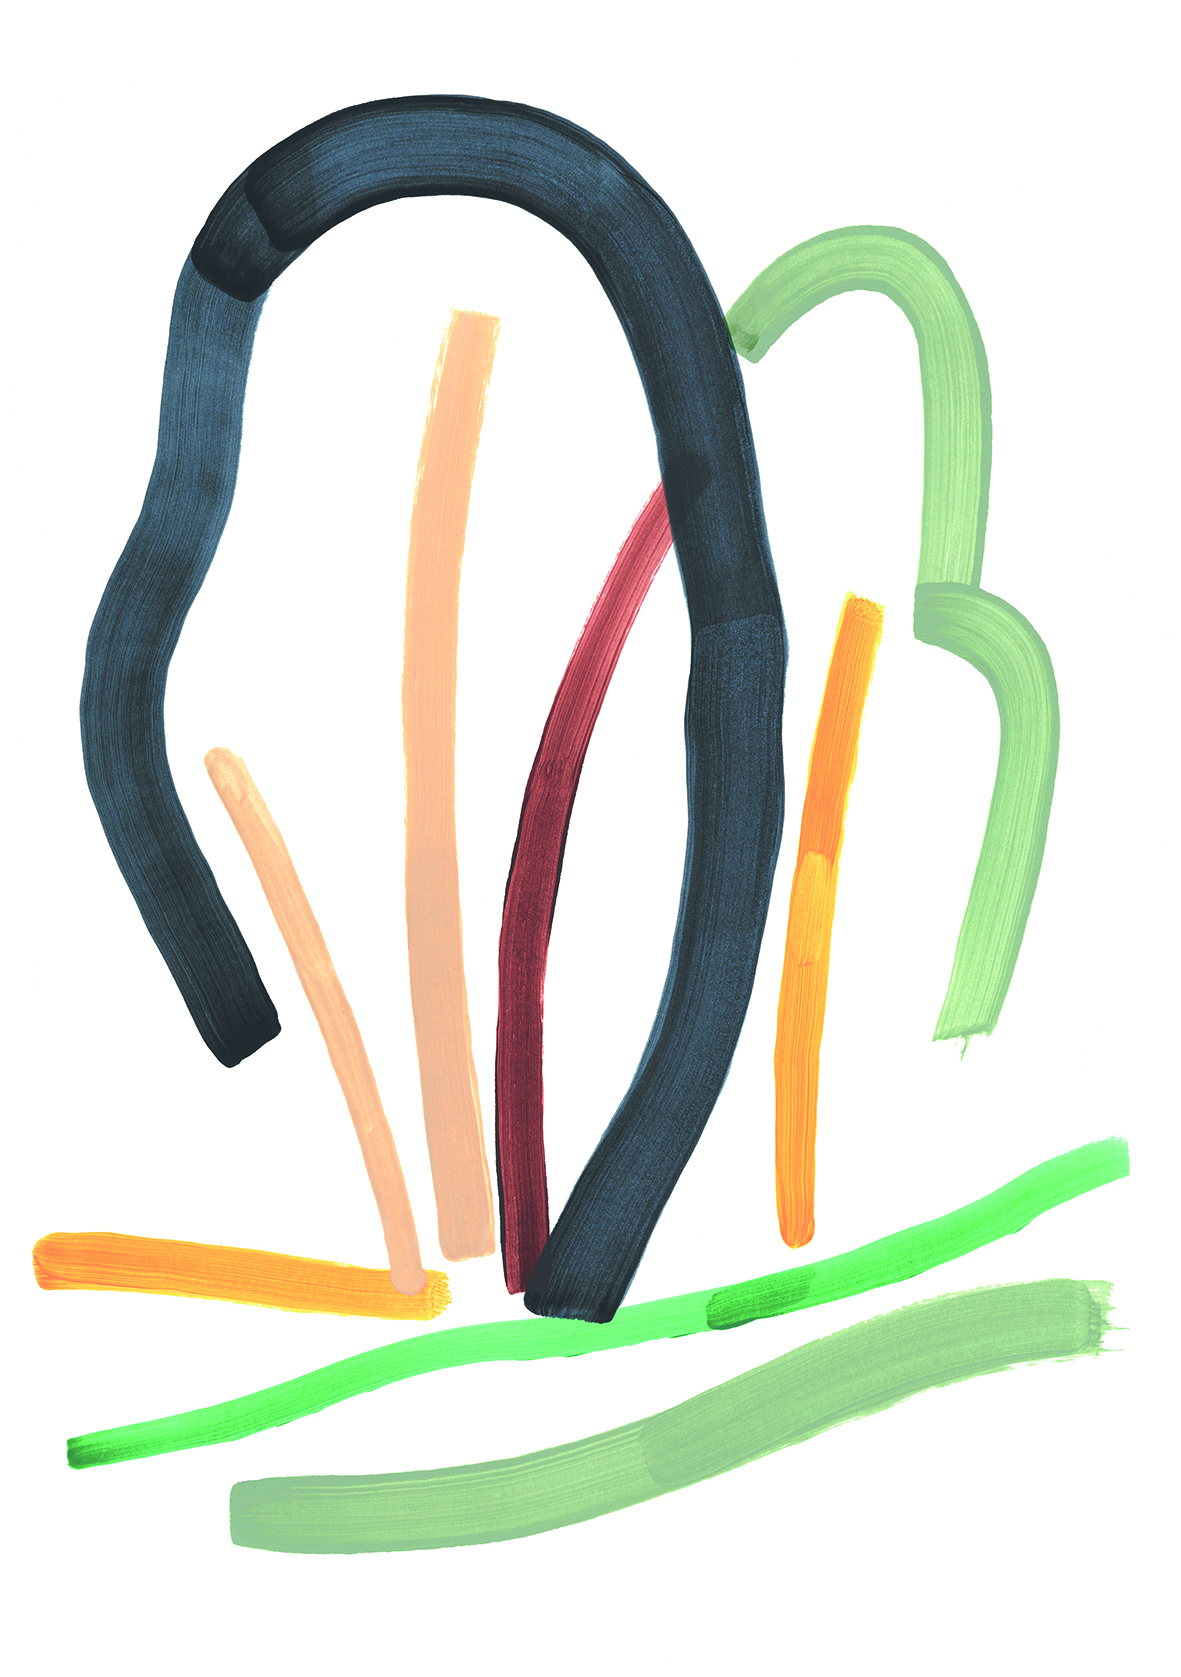 Linnaean_Vegetable_charlottetrounce.jpg